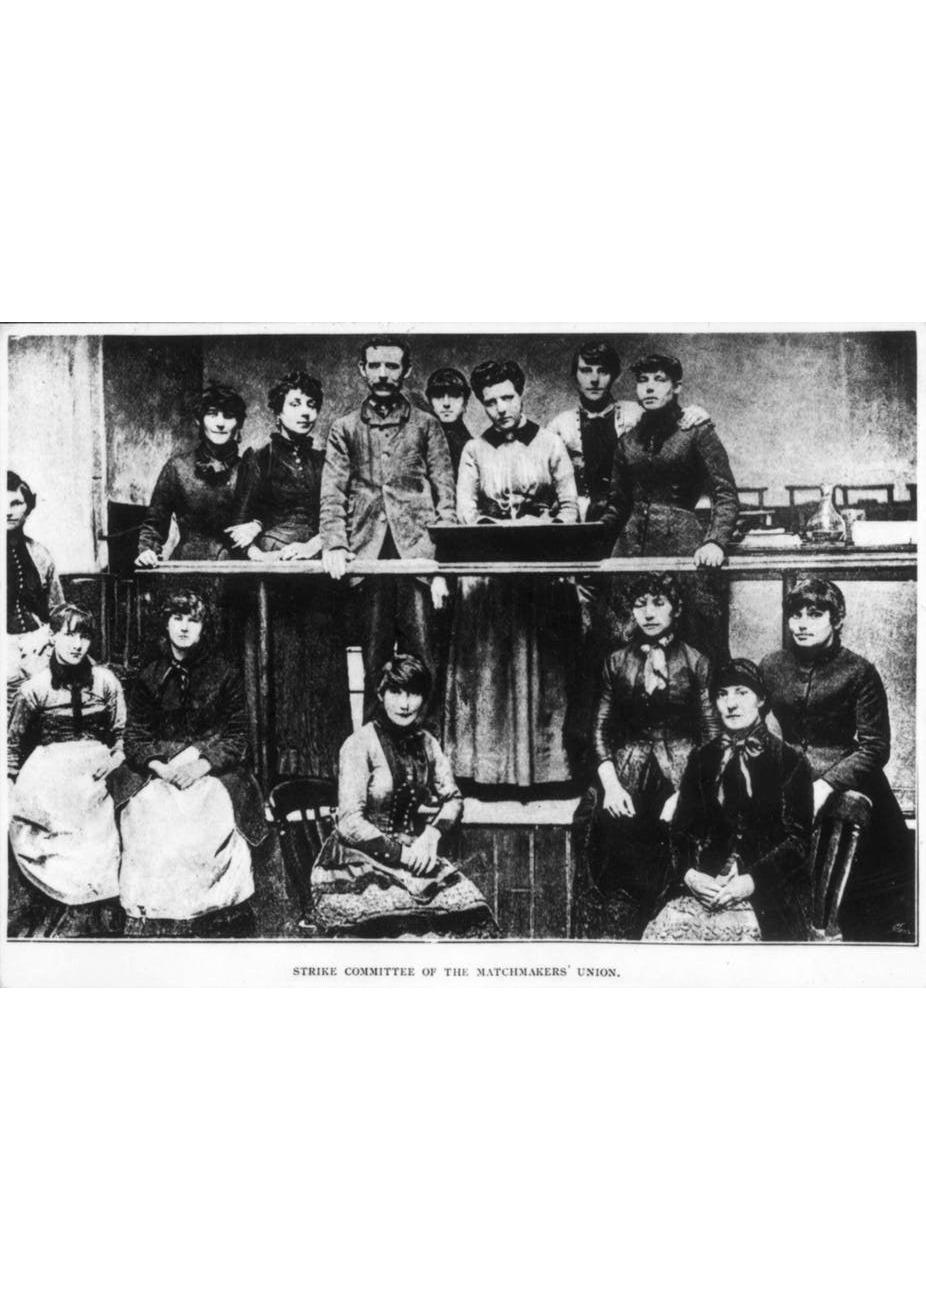 match women strike committee (1)